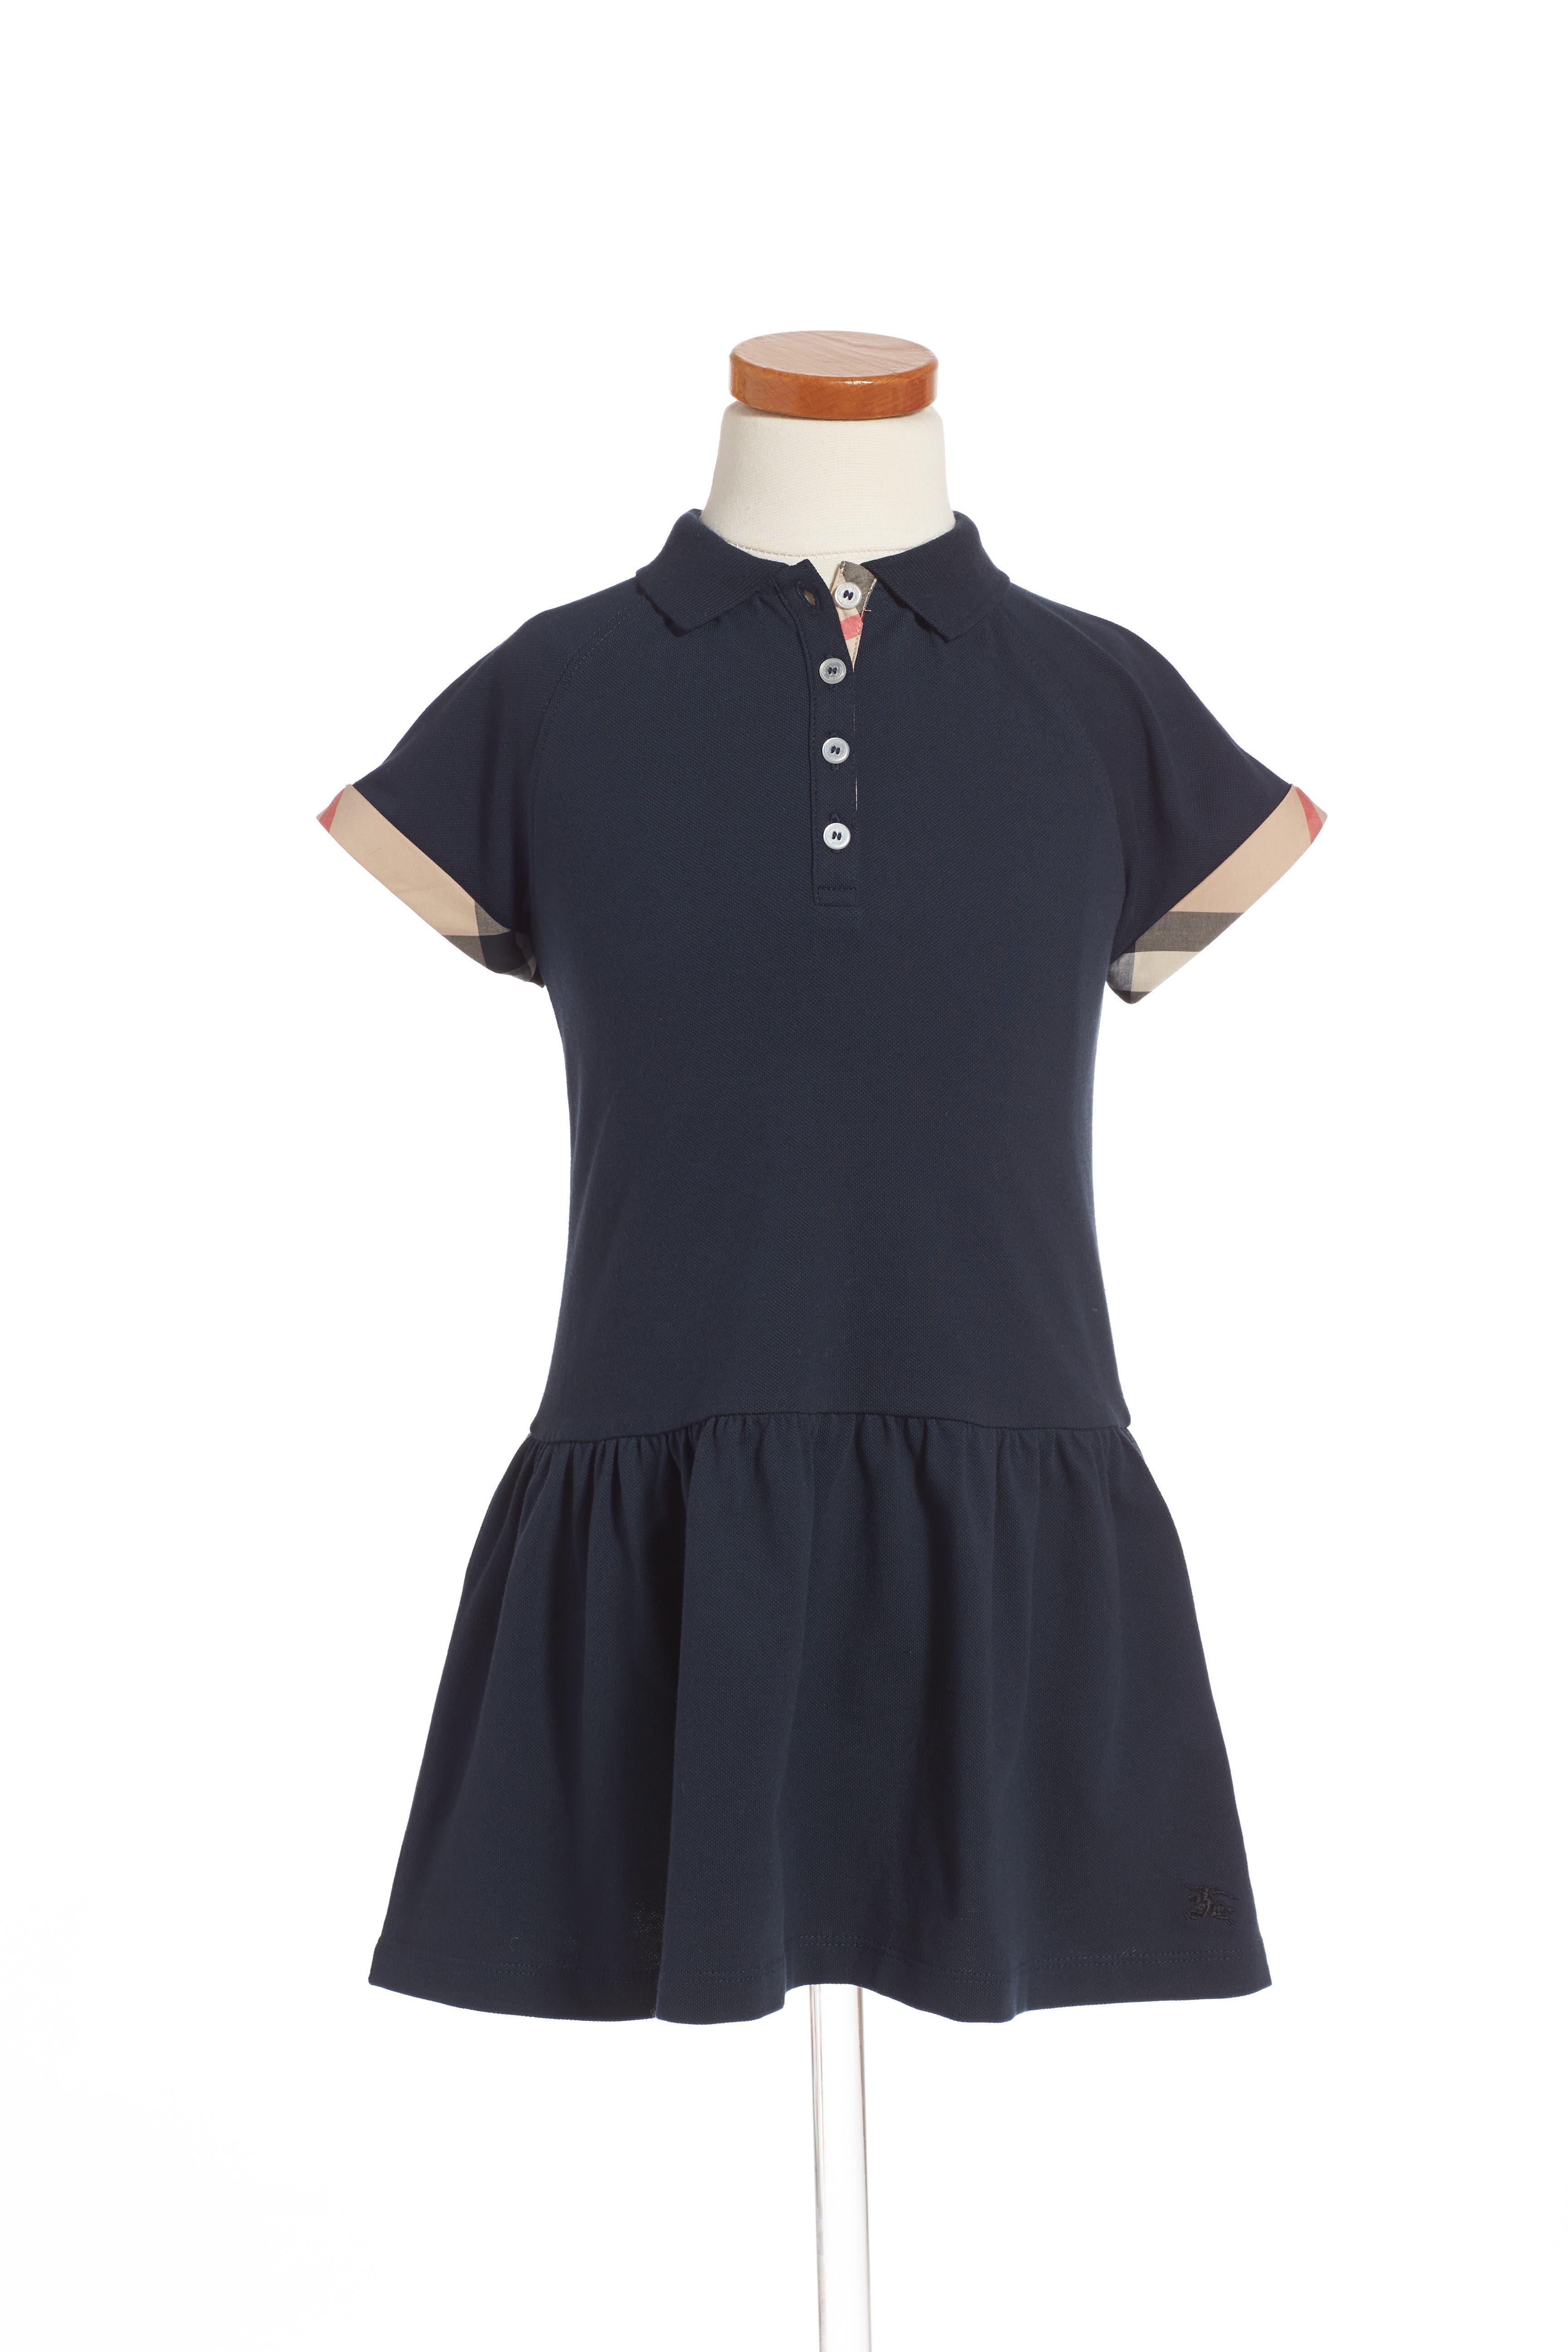 Main Image - Burberry 'Mini Cali' Polo Dress (Toddler Girls, Little Girls & Big Girls)